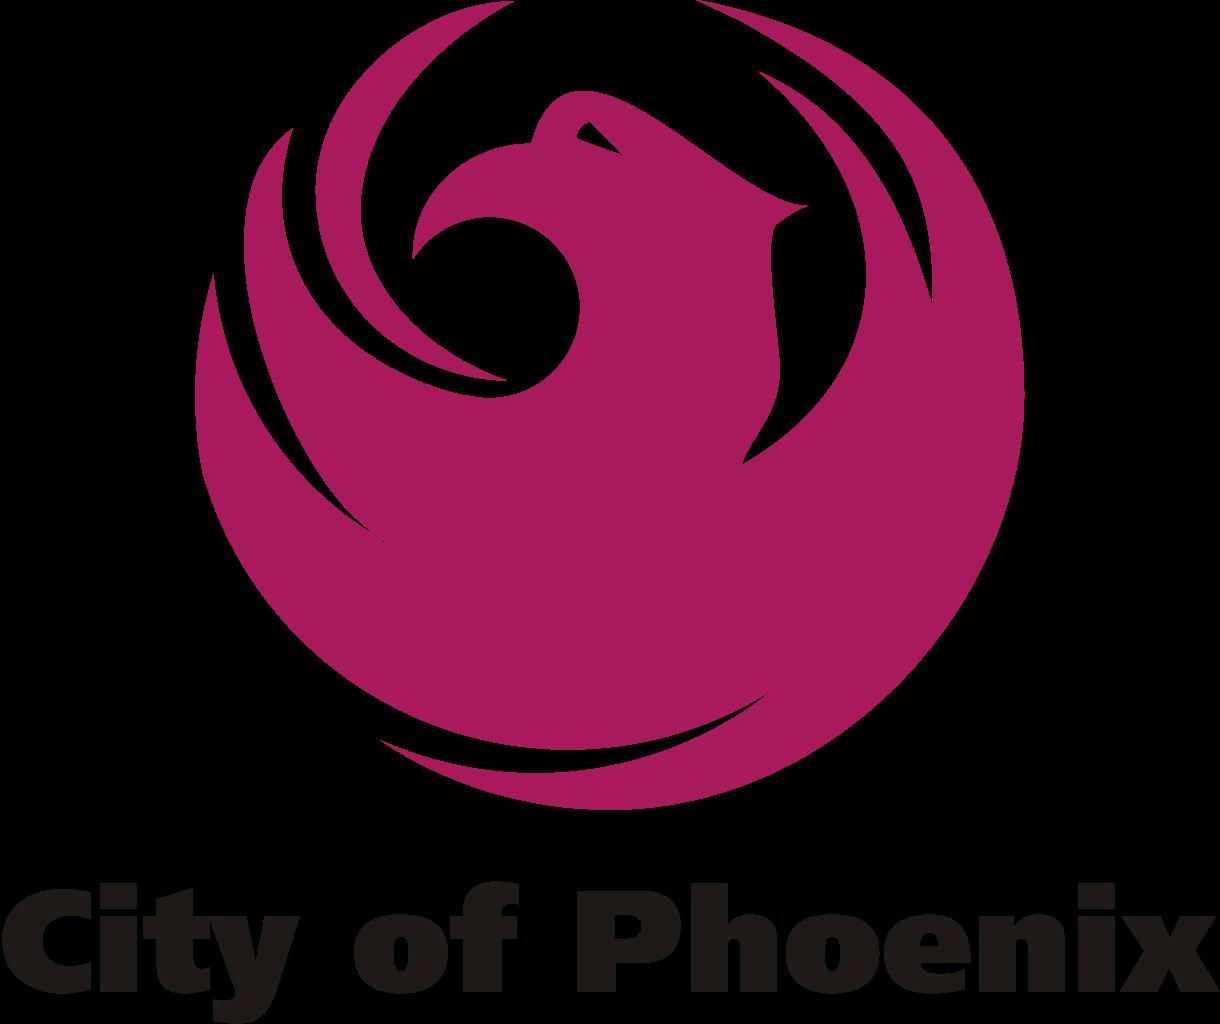 John F. Long Family Services (Phoenix Family Services)